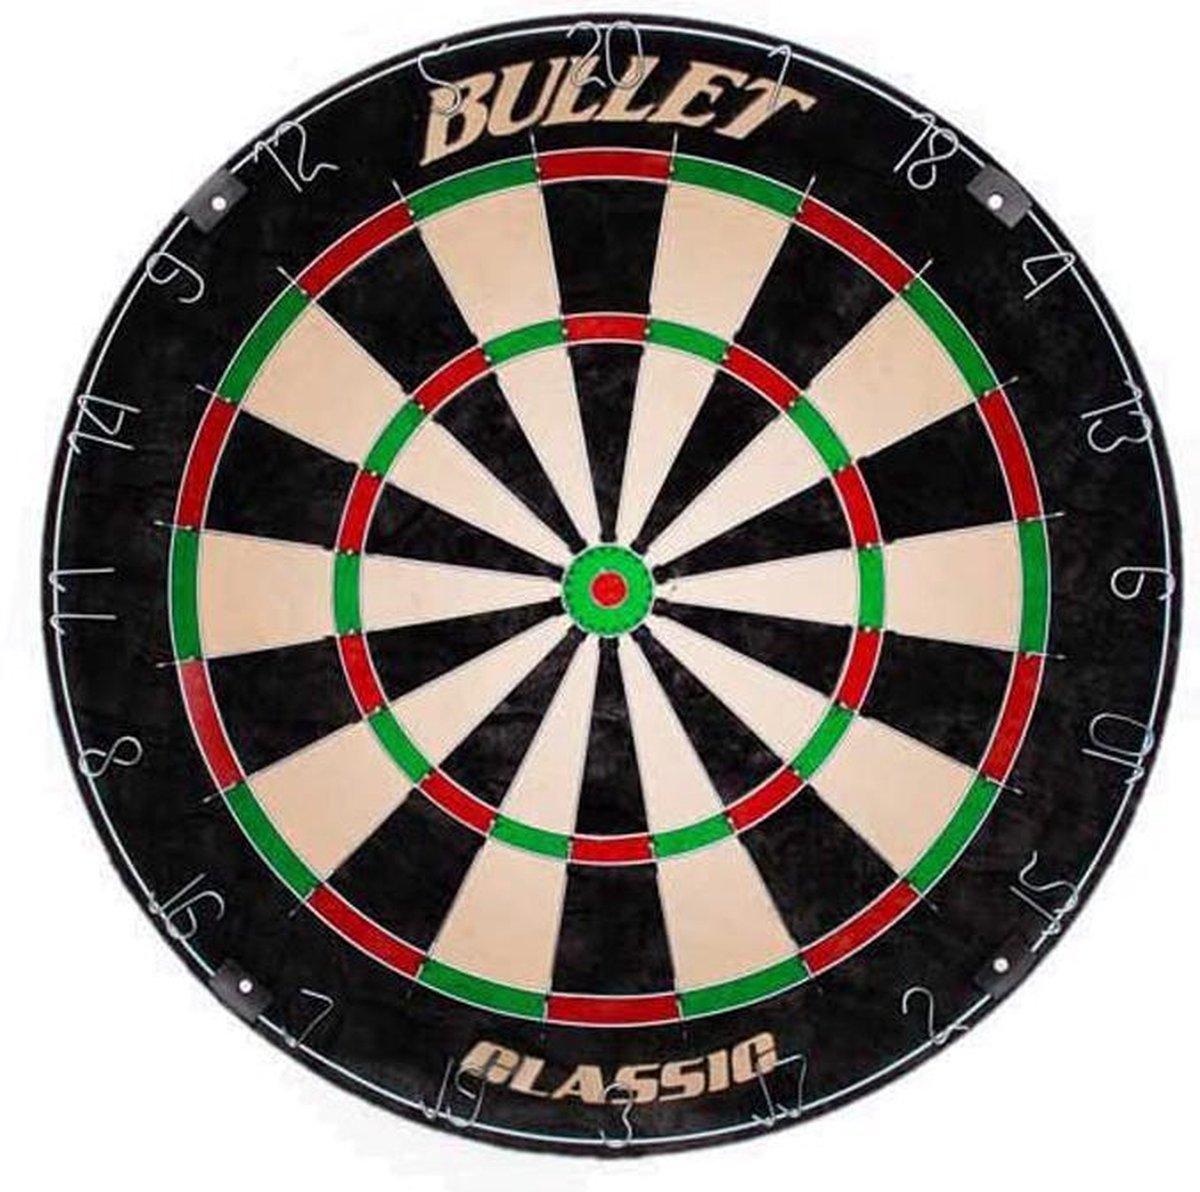 Dragon darts Bullet classic - dartbord - steeltip - sisal